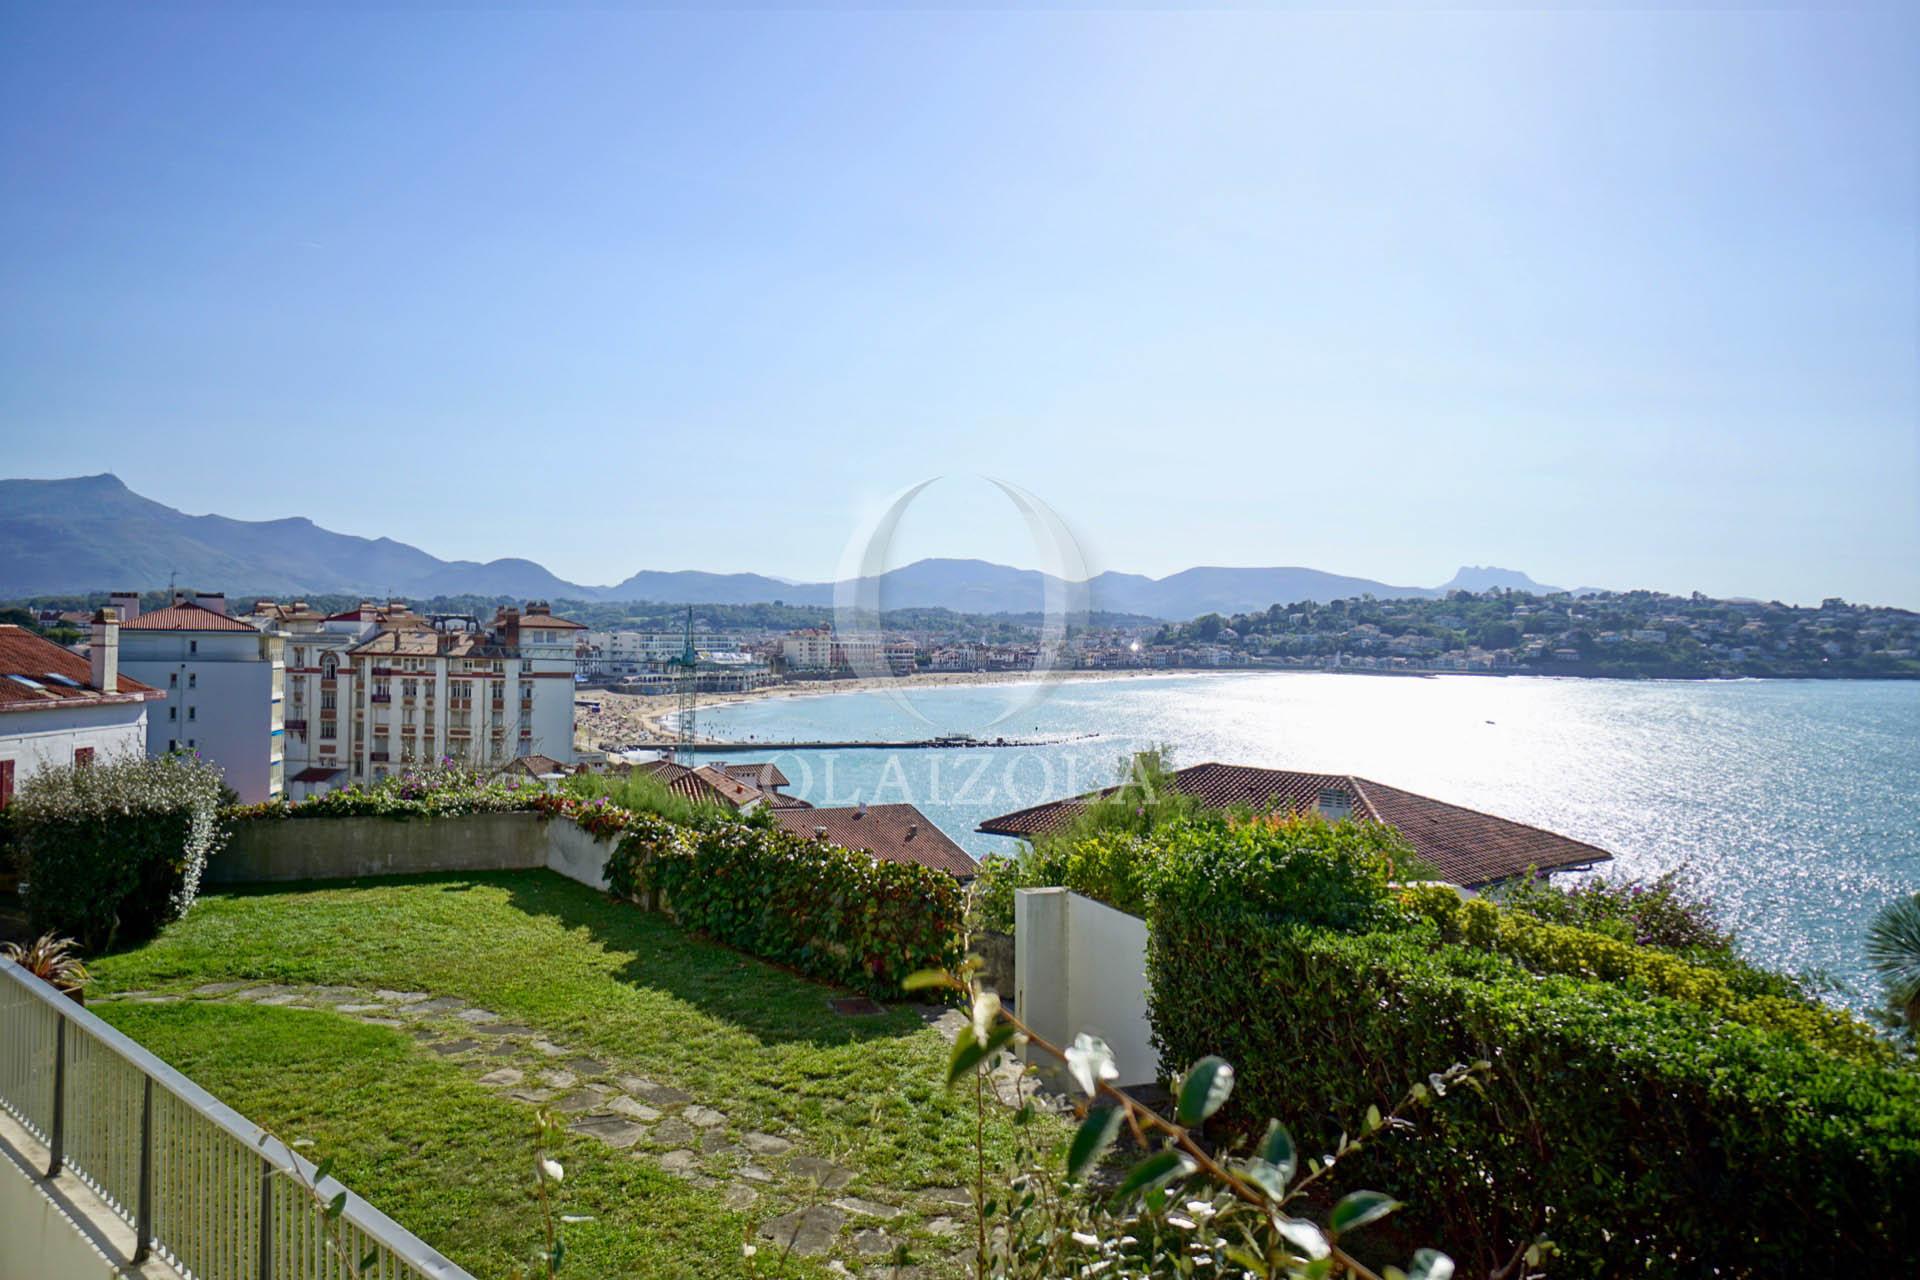 f52d1f528d0 Location de vacances à Saint-Jean-de-Luz - COQUET VUE MER ...